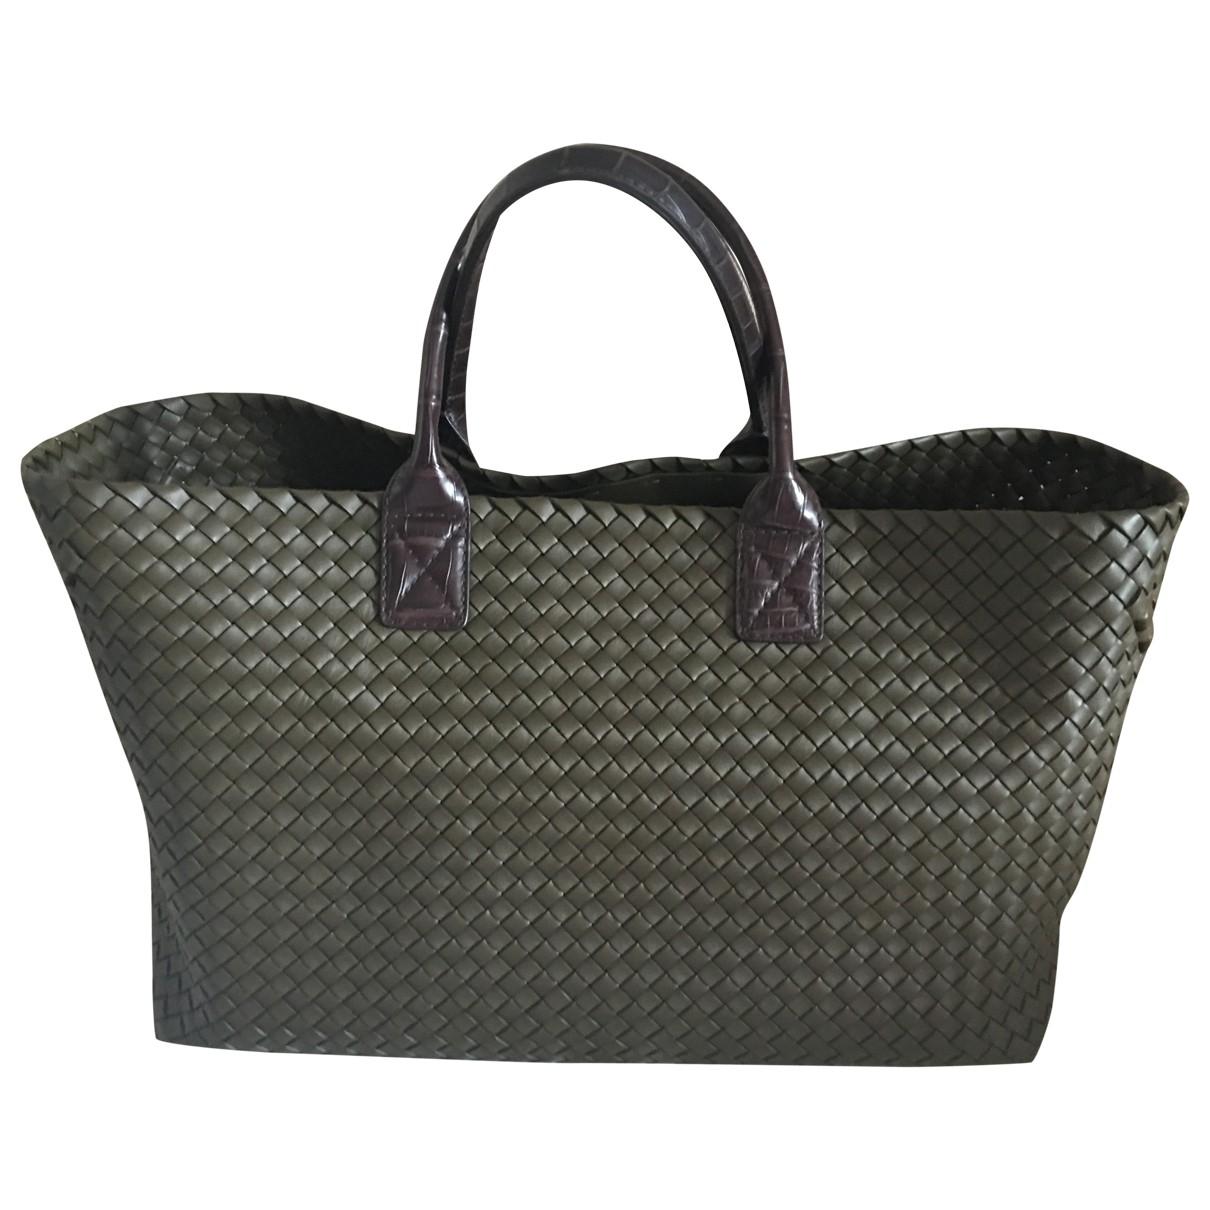 Bottega Veneta Fourre-Tout  Khaki Leather handbag for Women \N